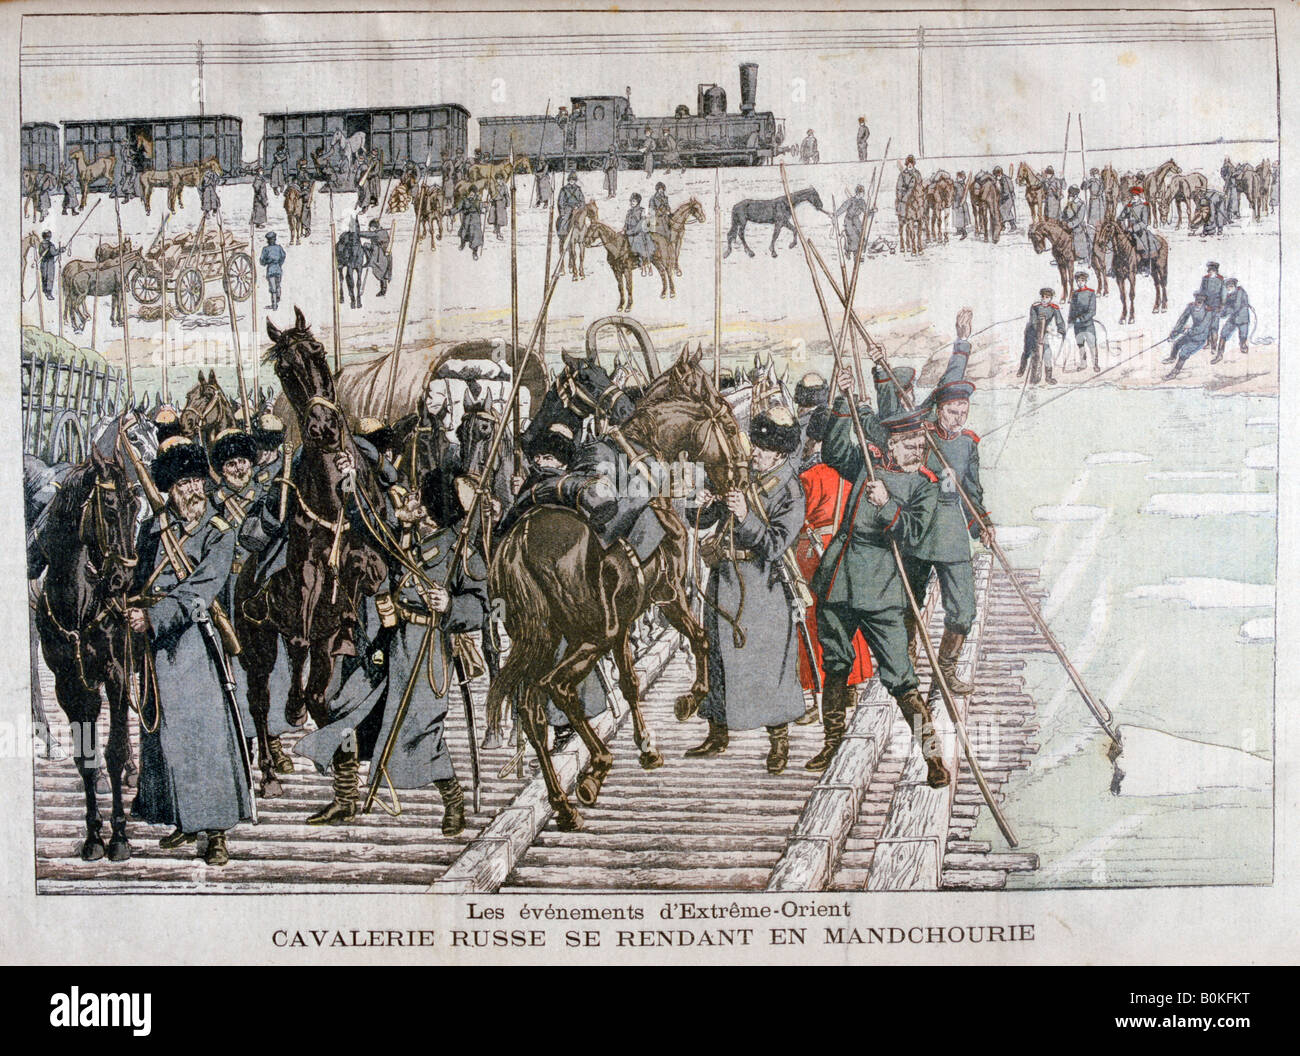 Russian cavalry heading into Mandchourie, China, 1900. Artist: Eugene Damblans - Stock Image